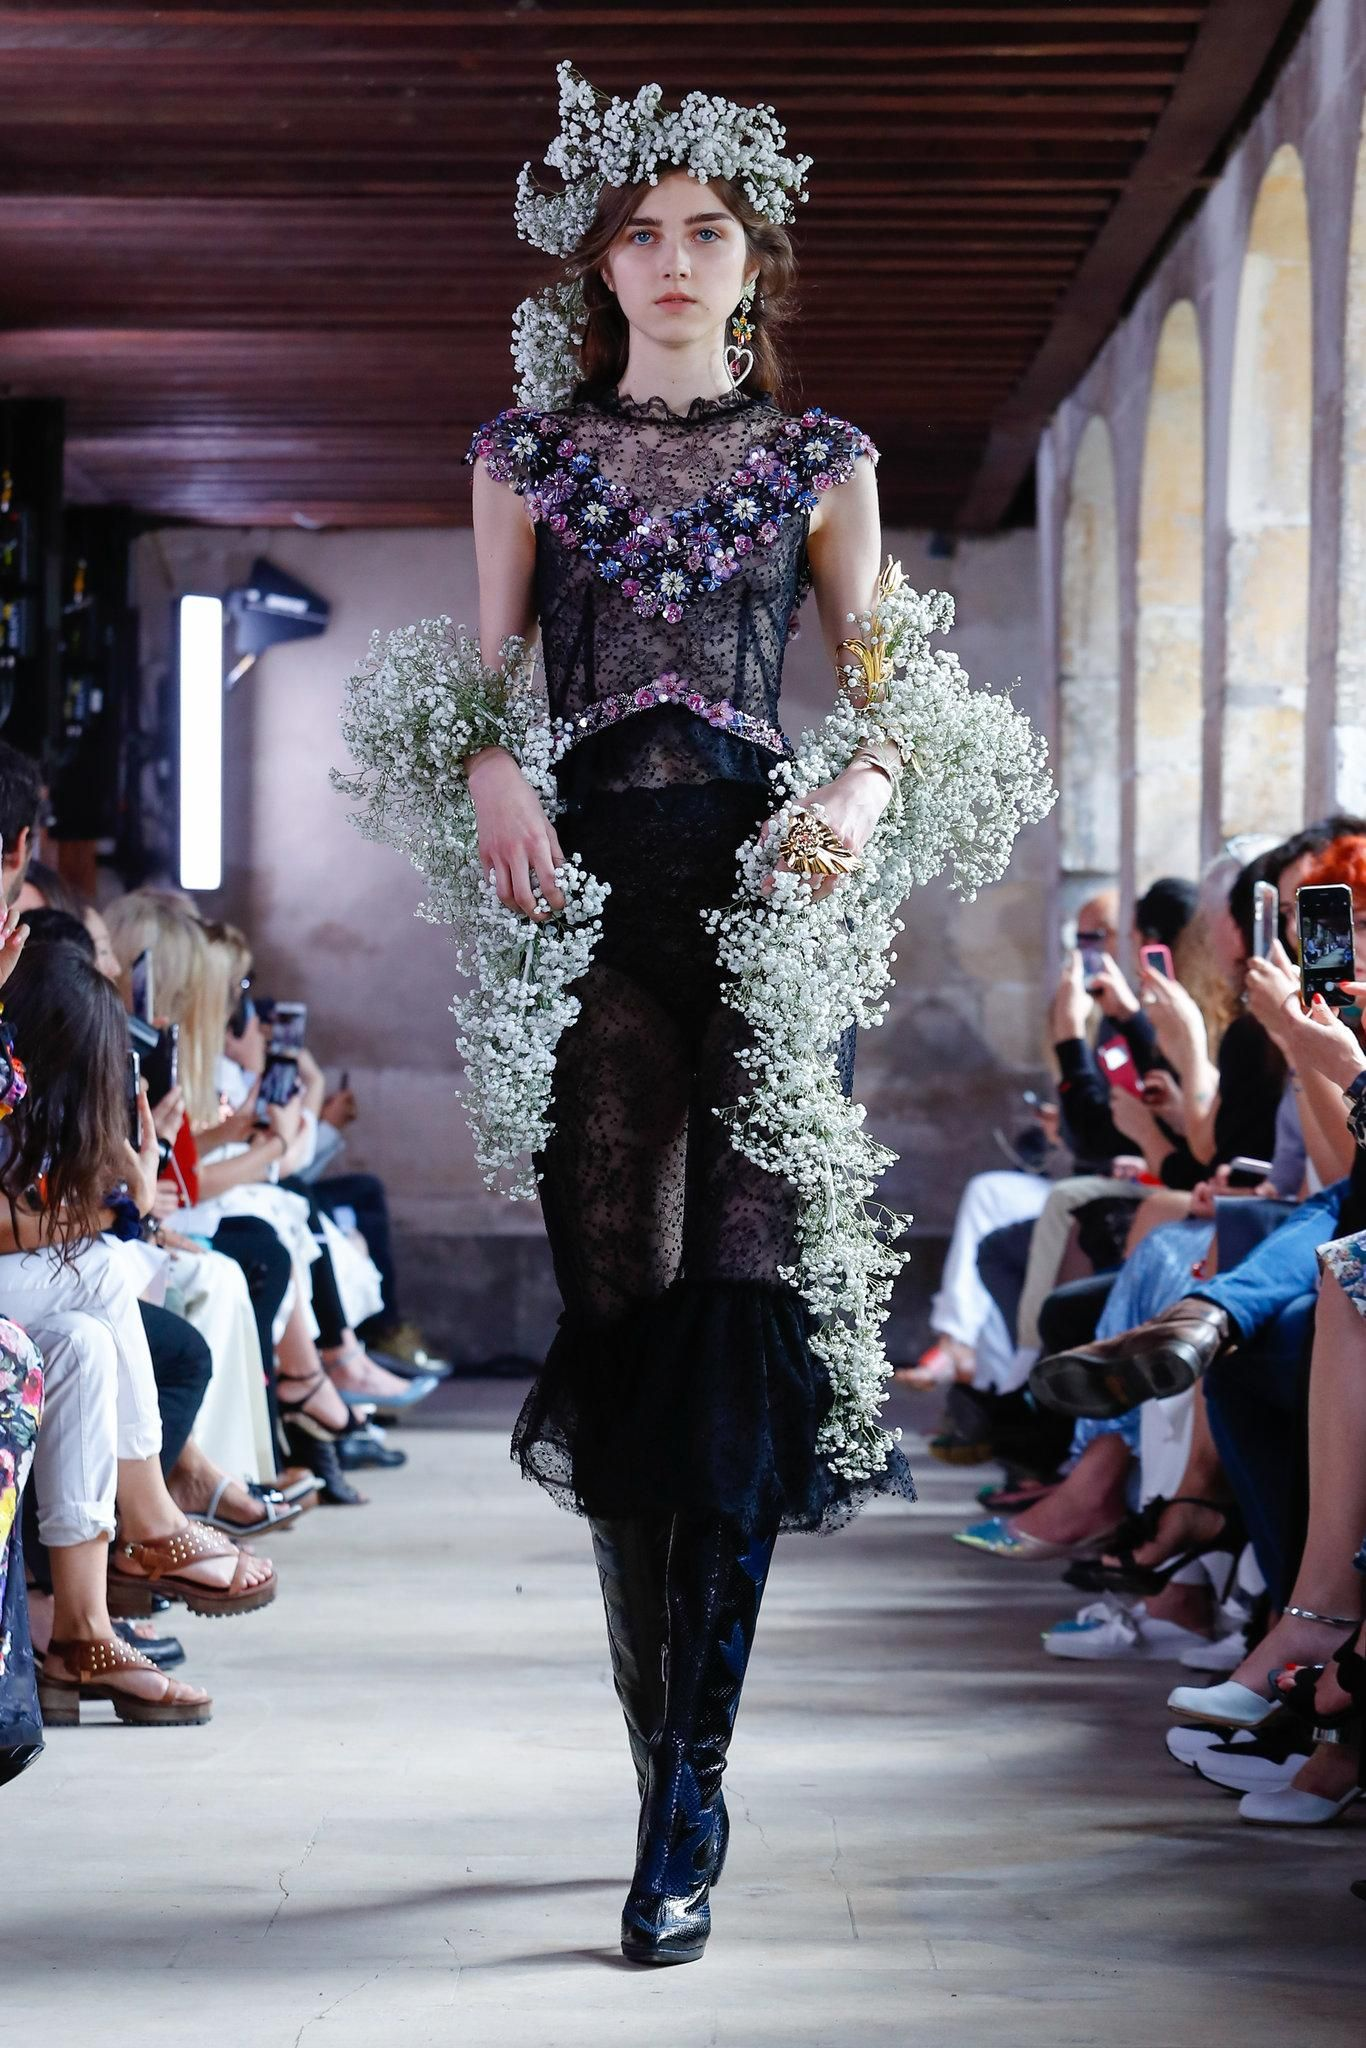 Lace dress styles 2018  Rodarte Spring   Lace Dresses Style  Pinterest  Lace dress